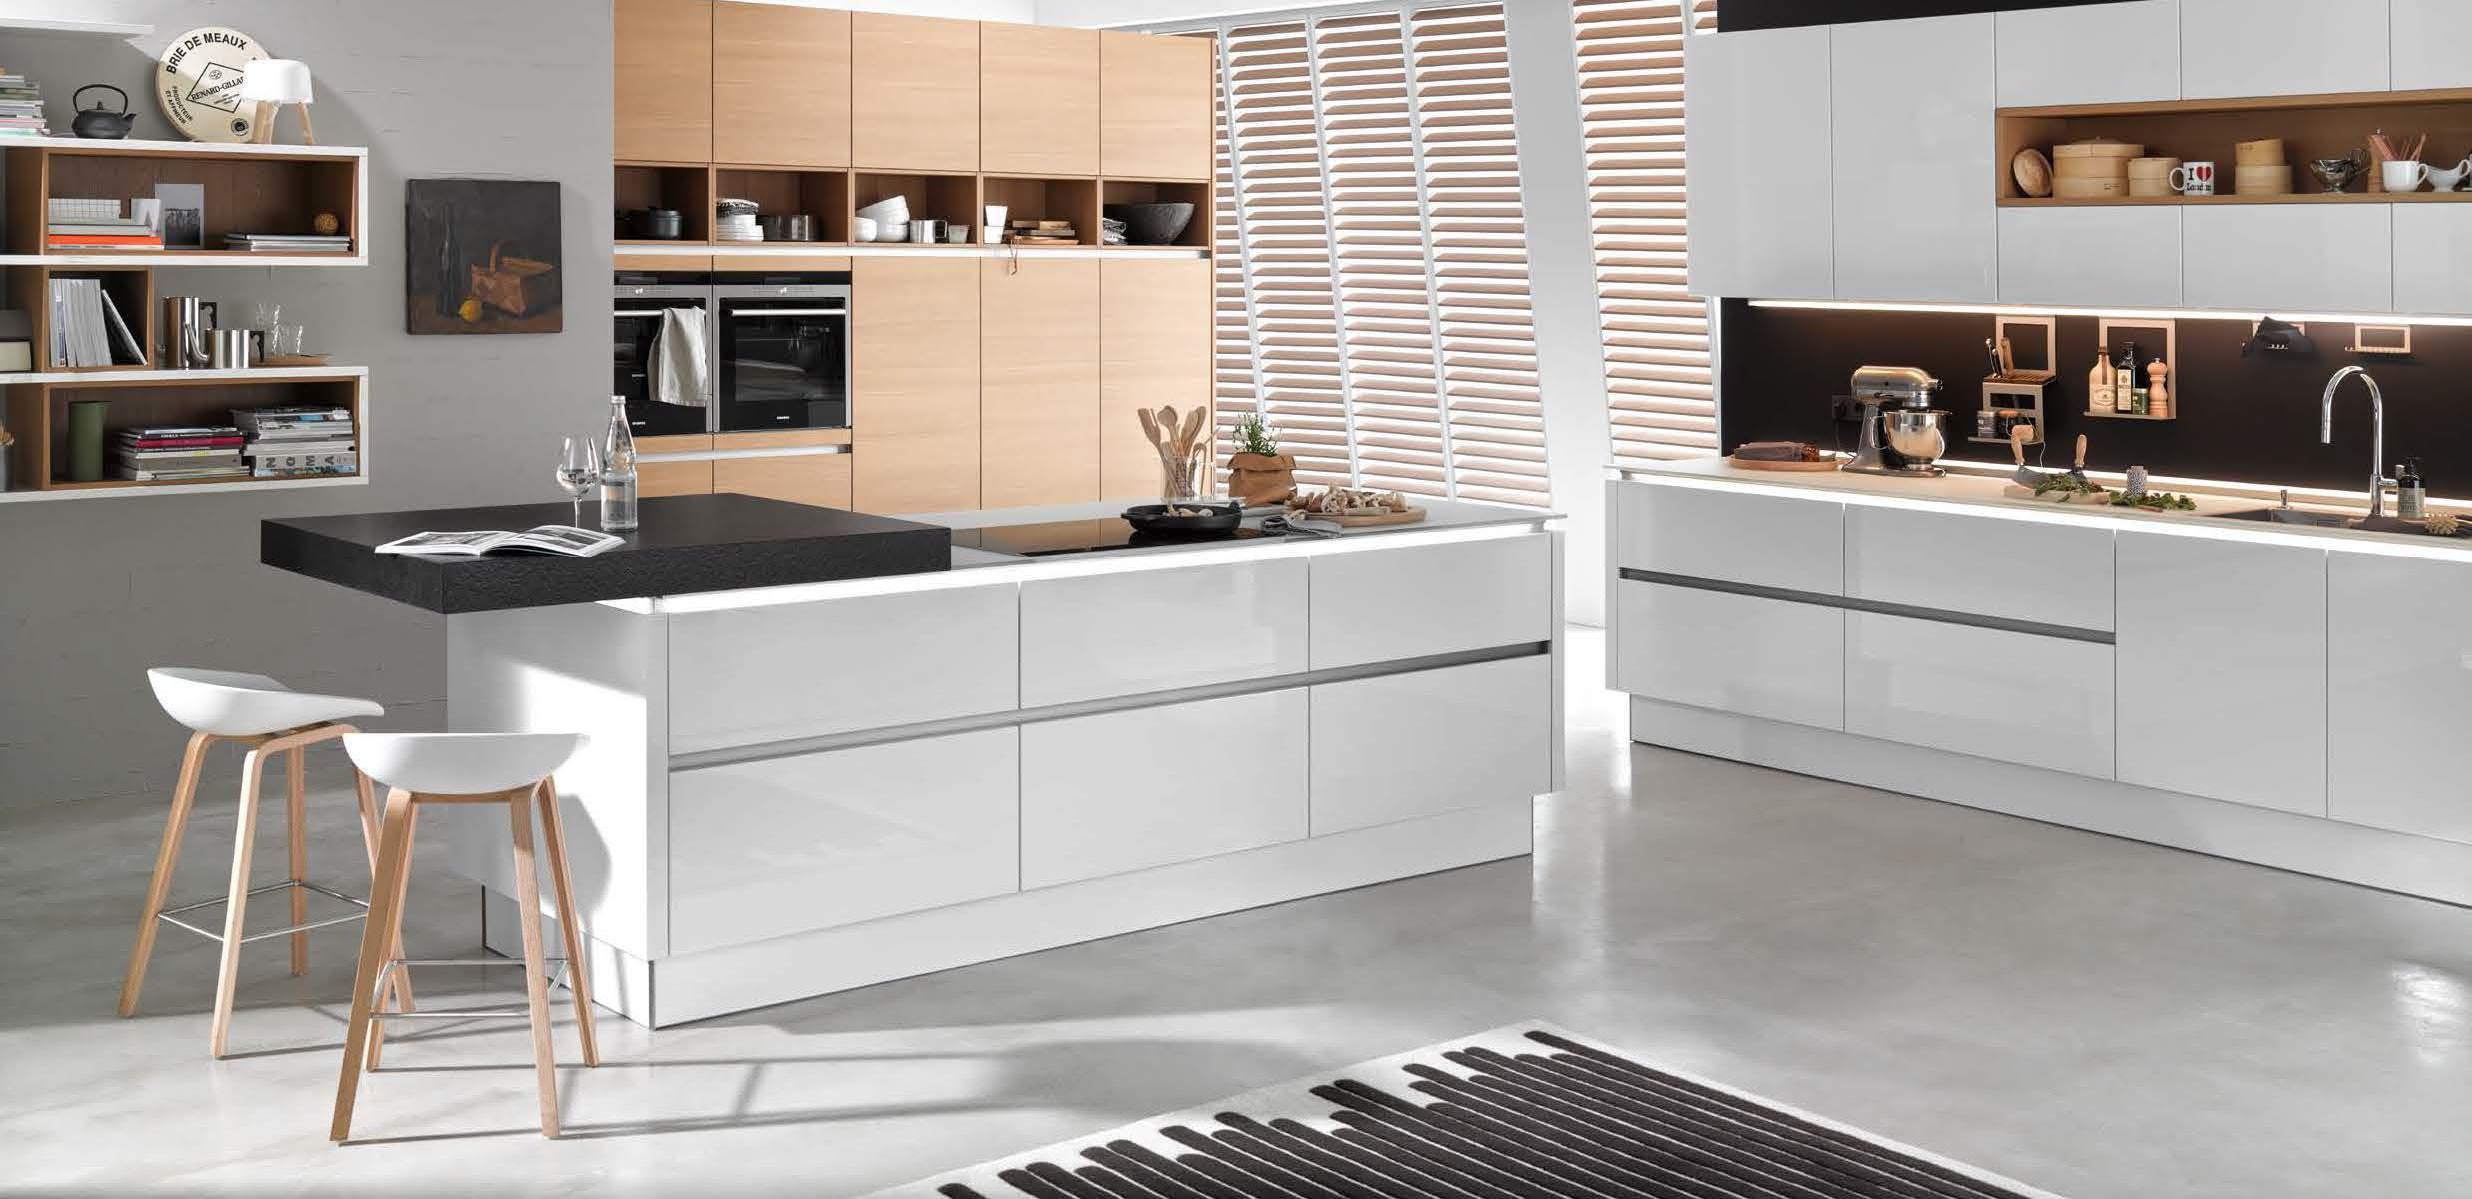 Matrix Art Funzionalit E Linee Pure Kuchendesign Le Cucine Di Qualit A Roma